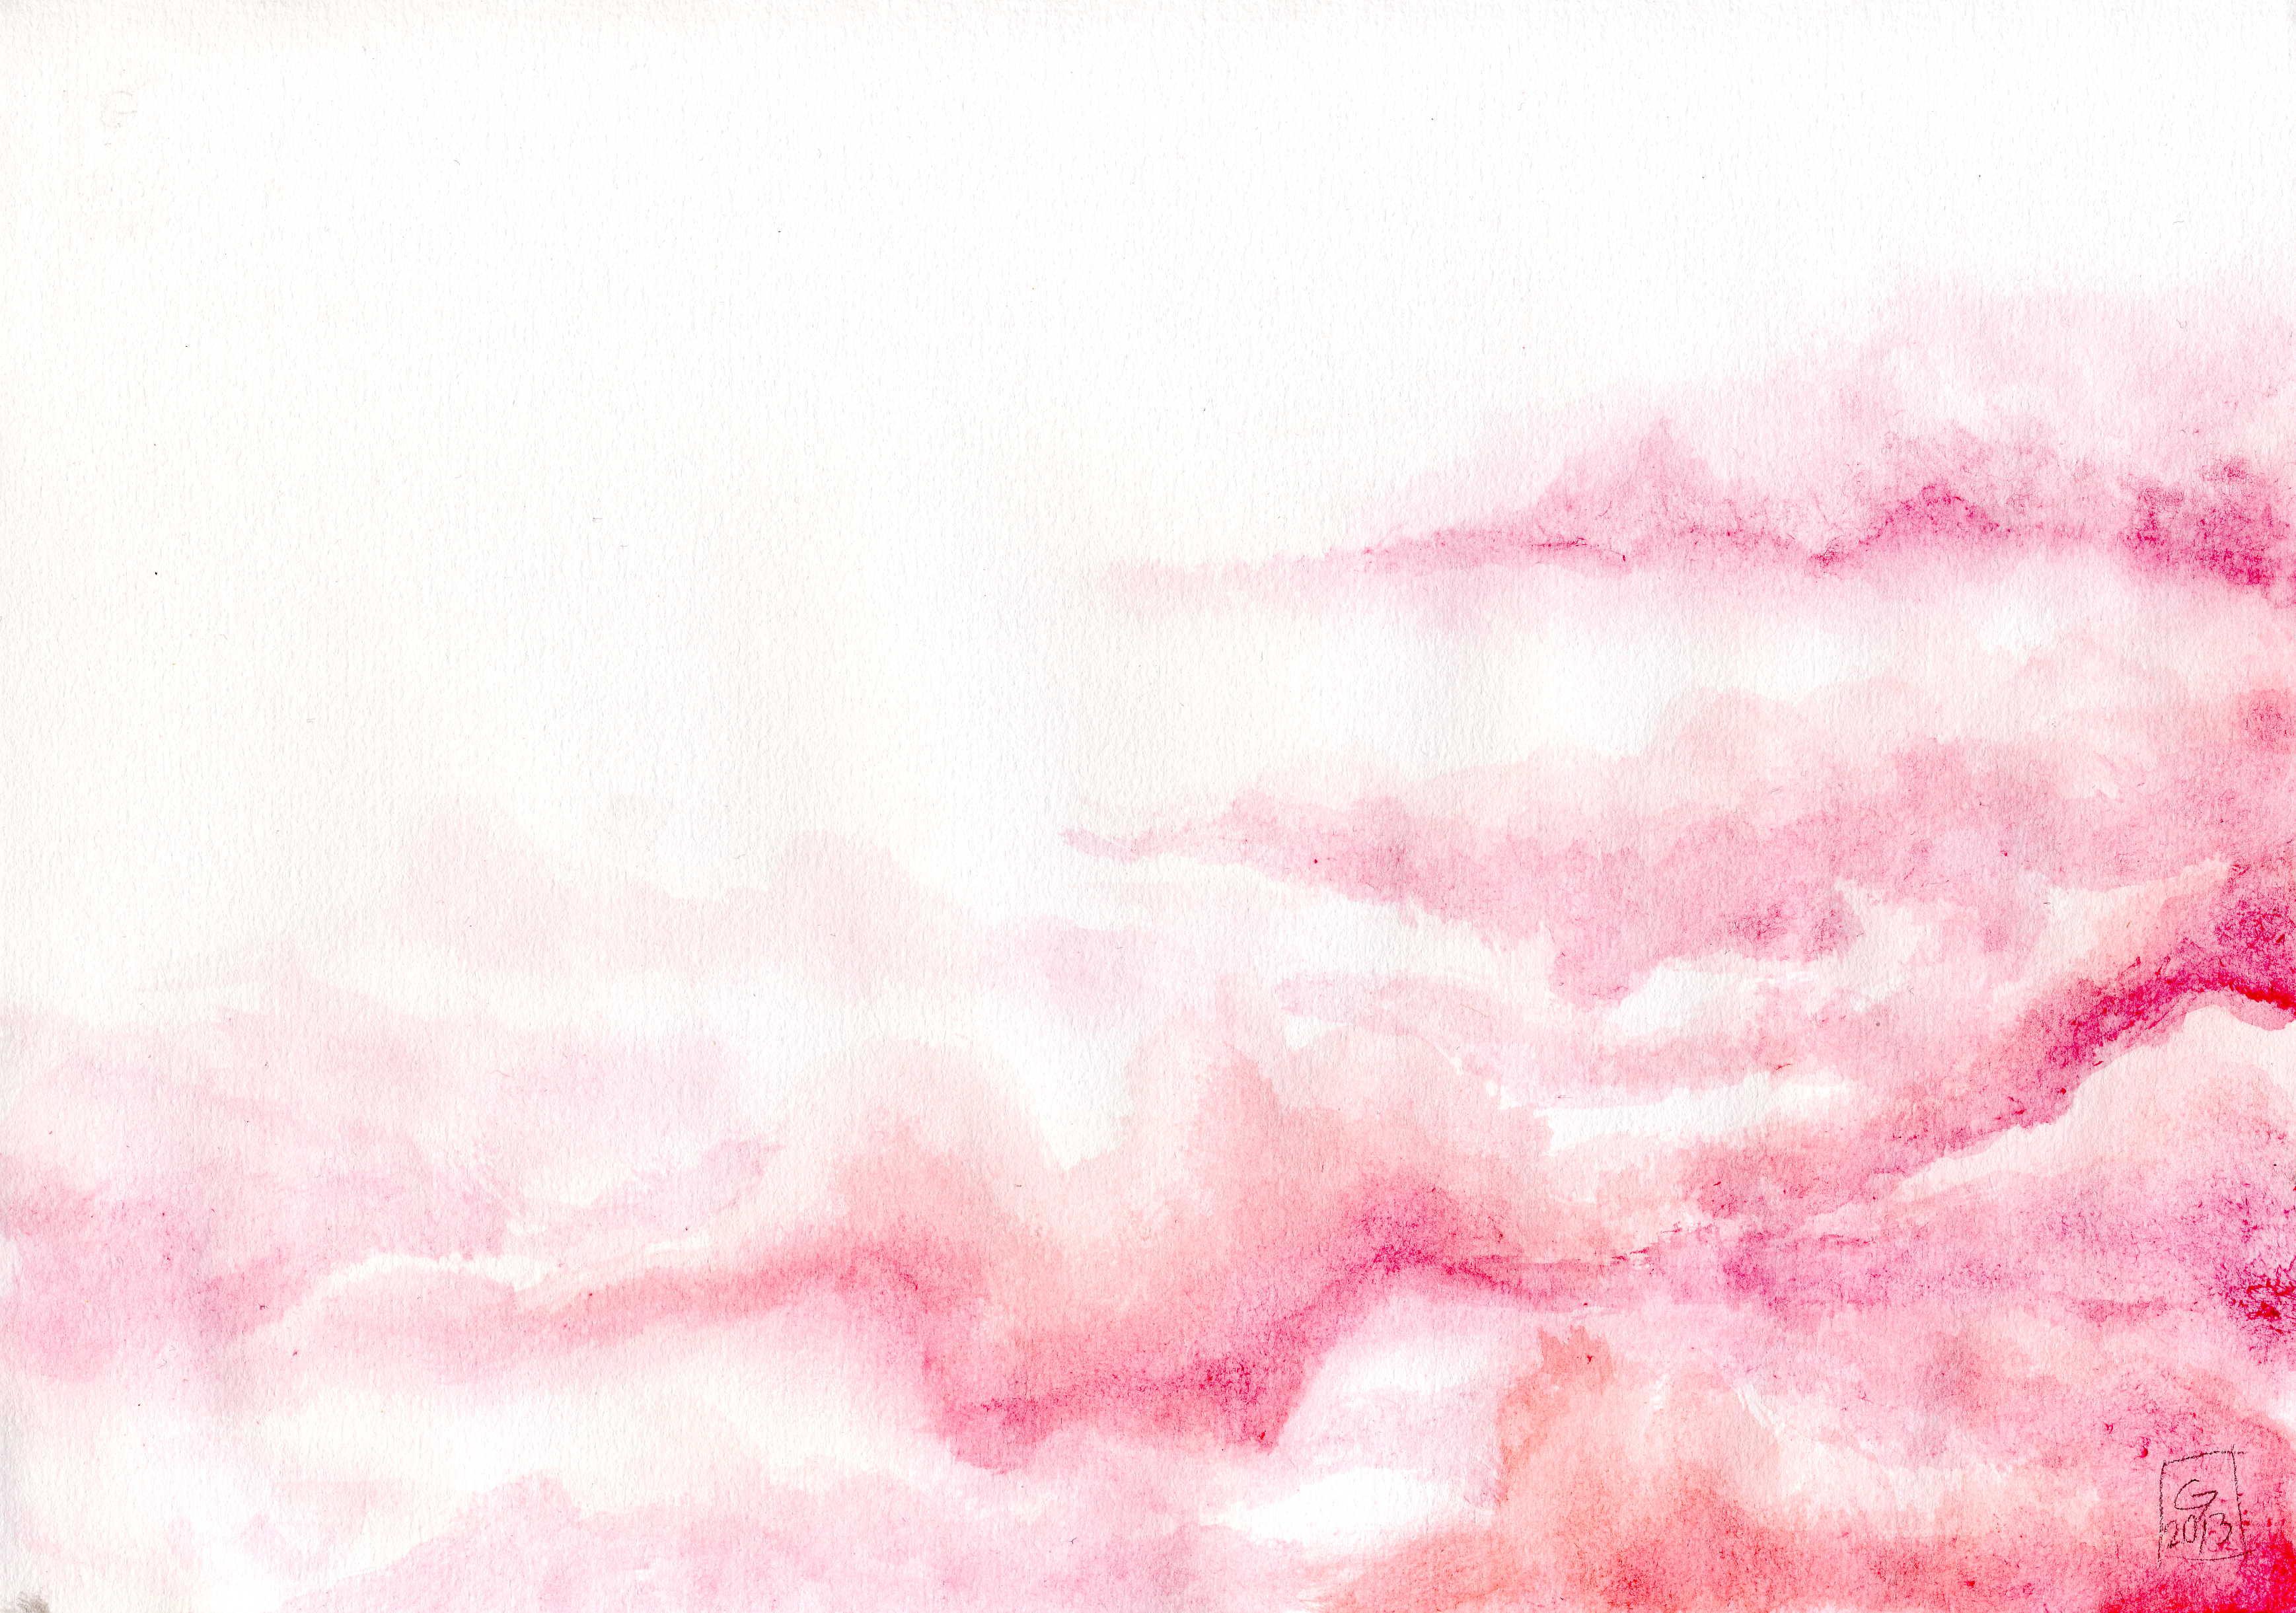 Pink clouds by Tamashi-Bjorn on DeviantArt